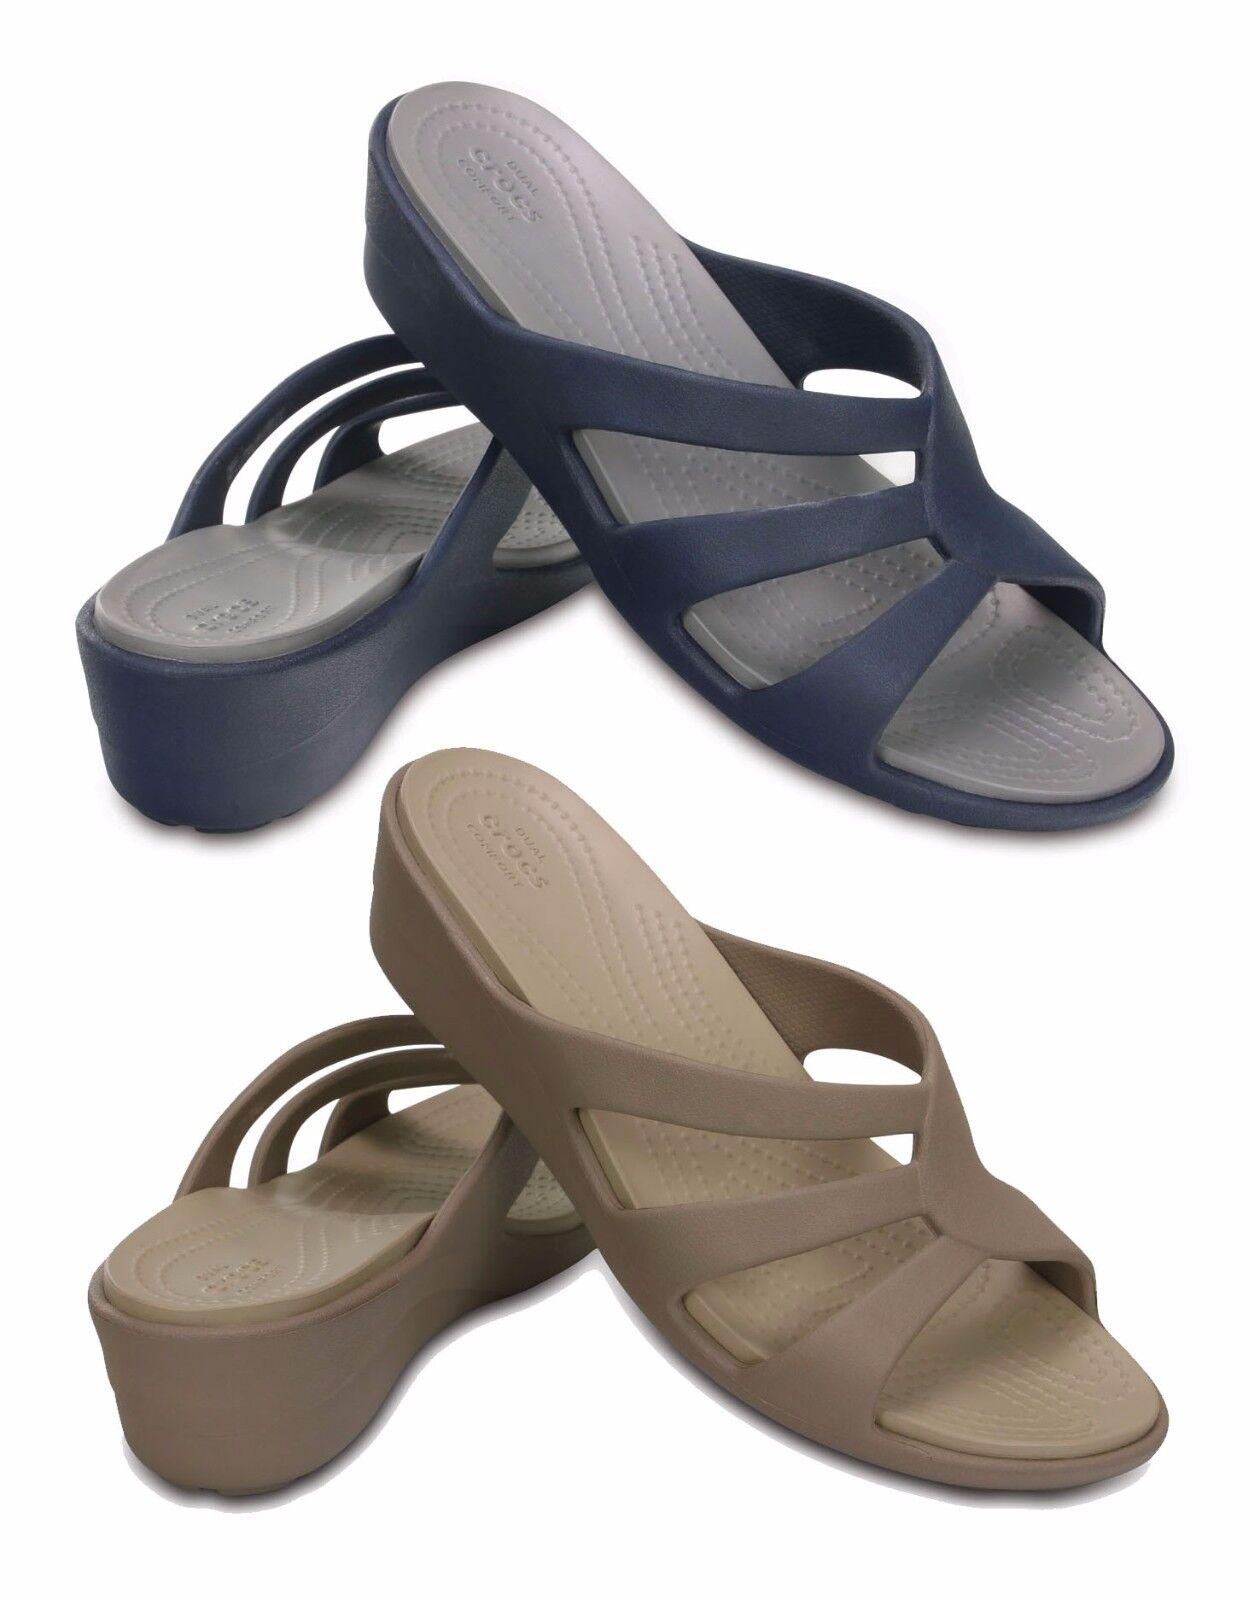 CROCS SANRAH STRAPPY wedge W women's shoes sandals flip-flops slippers wedge